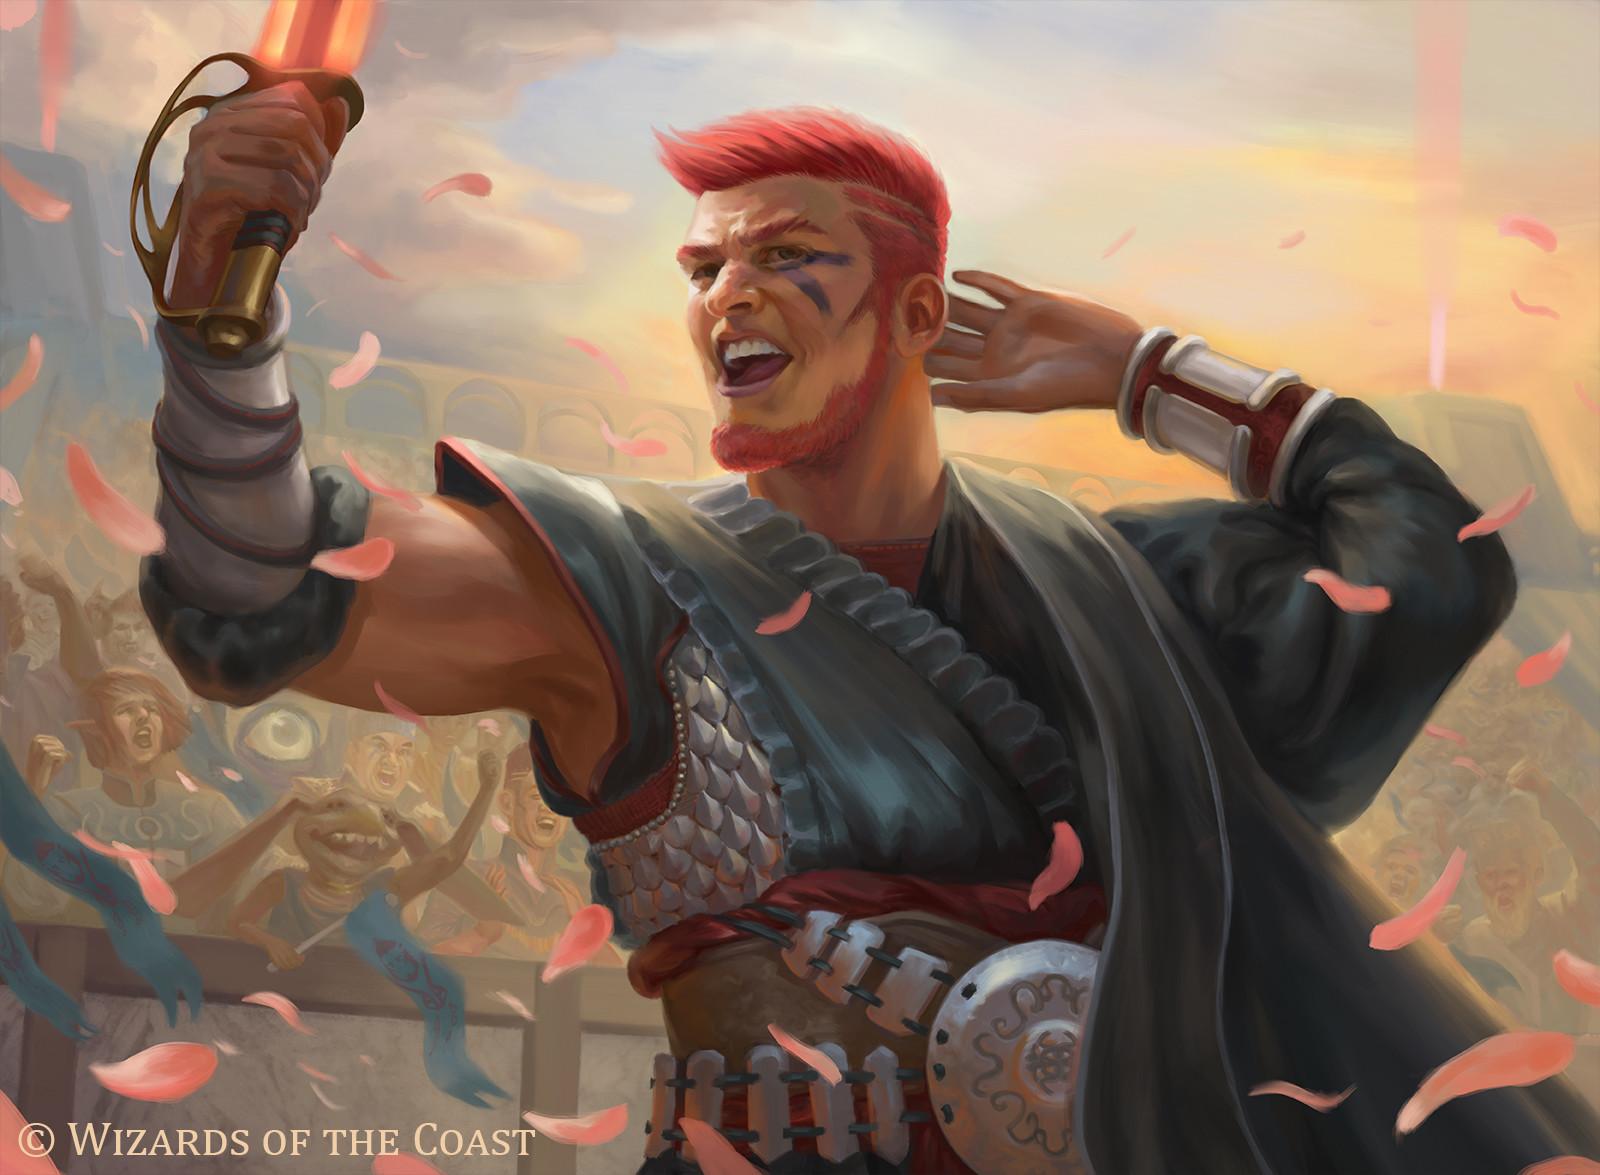 ArtStation - Fan Favorite (MTG: Battle Bond), Suzanne Helmigh